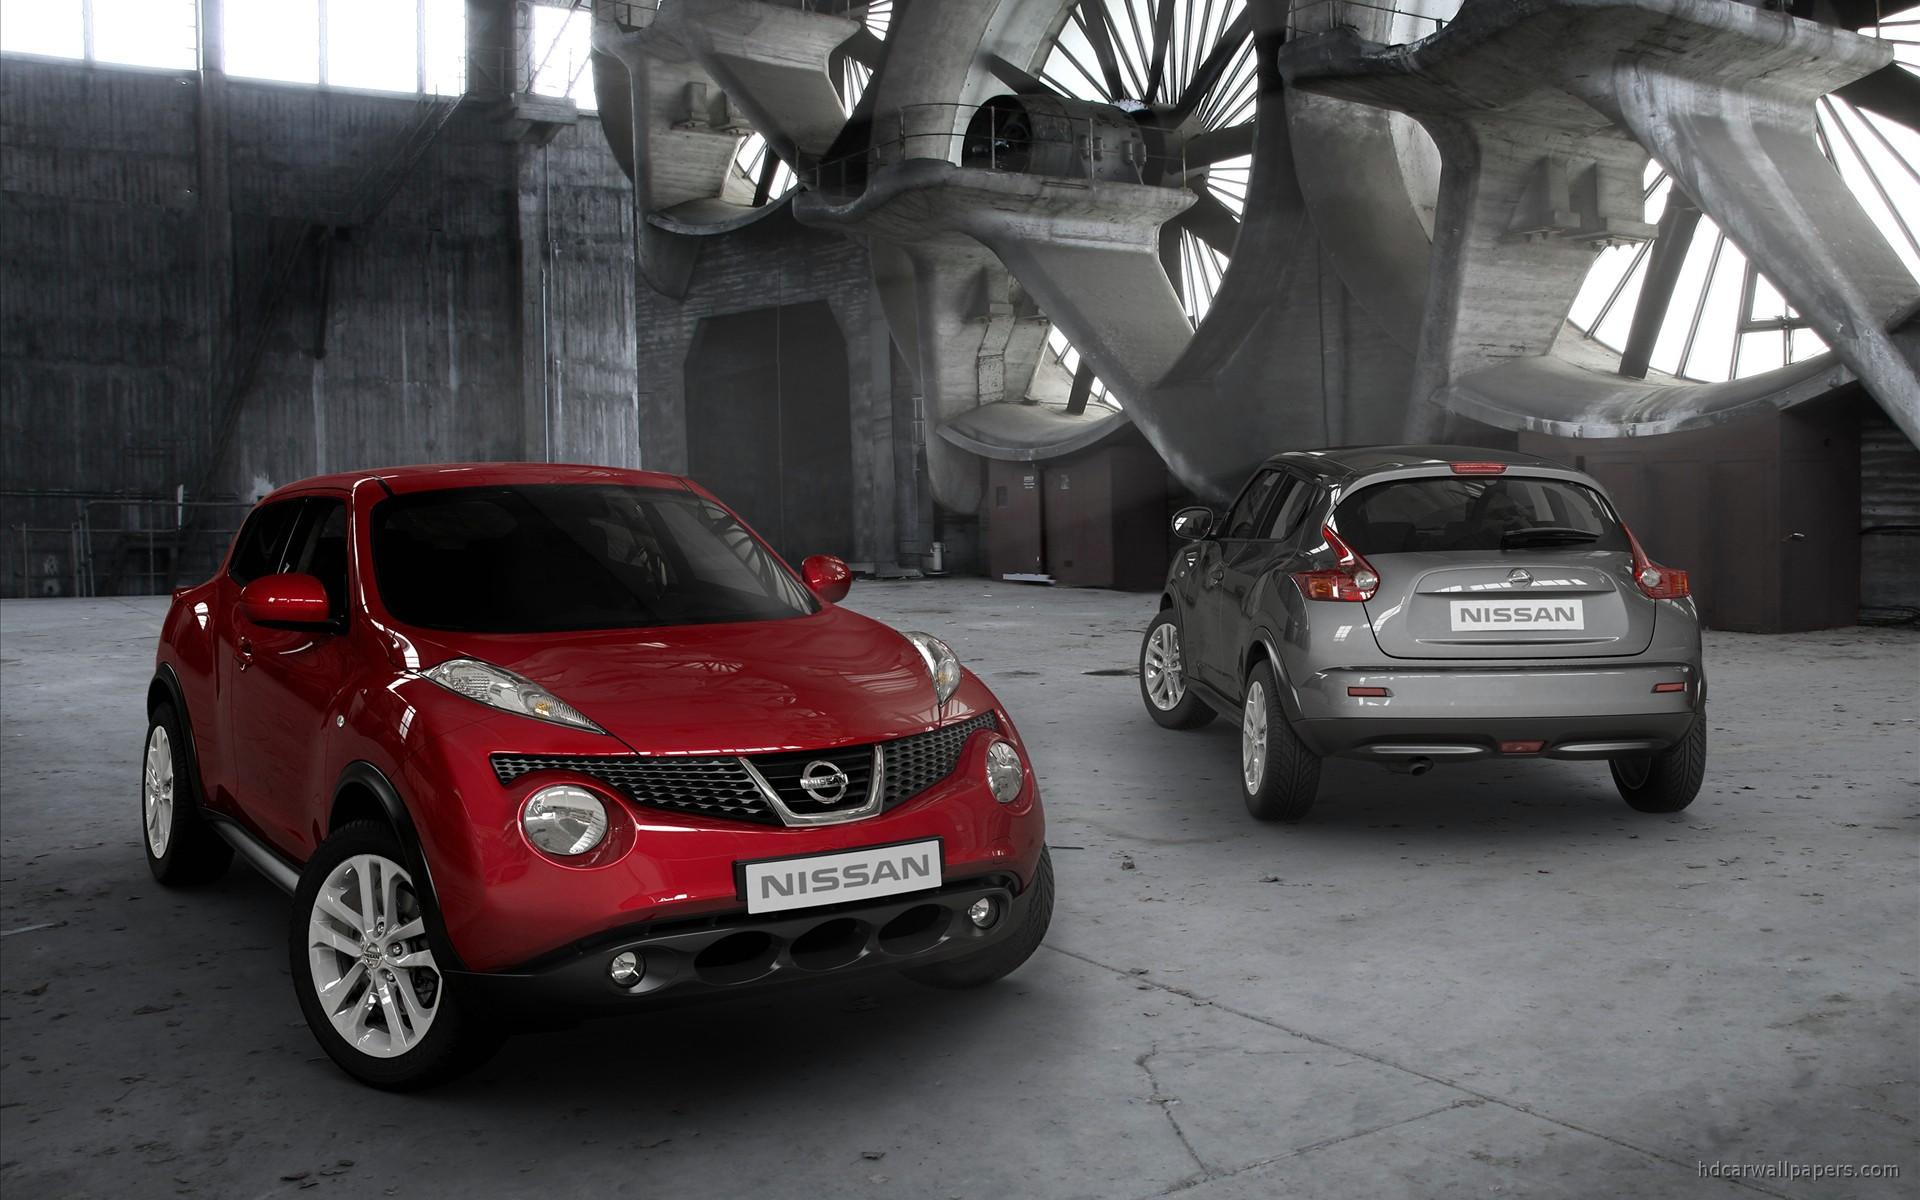 2011 Nissan Juke 4 Wallpaper Hd Car Wallpapers Id 1361